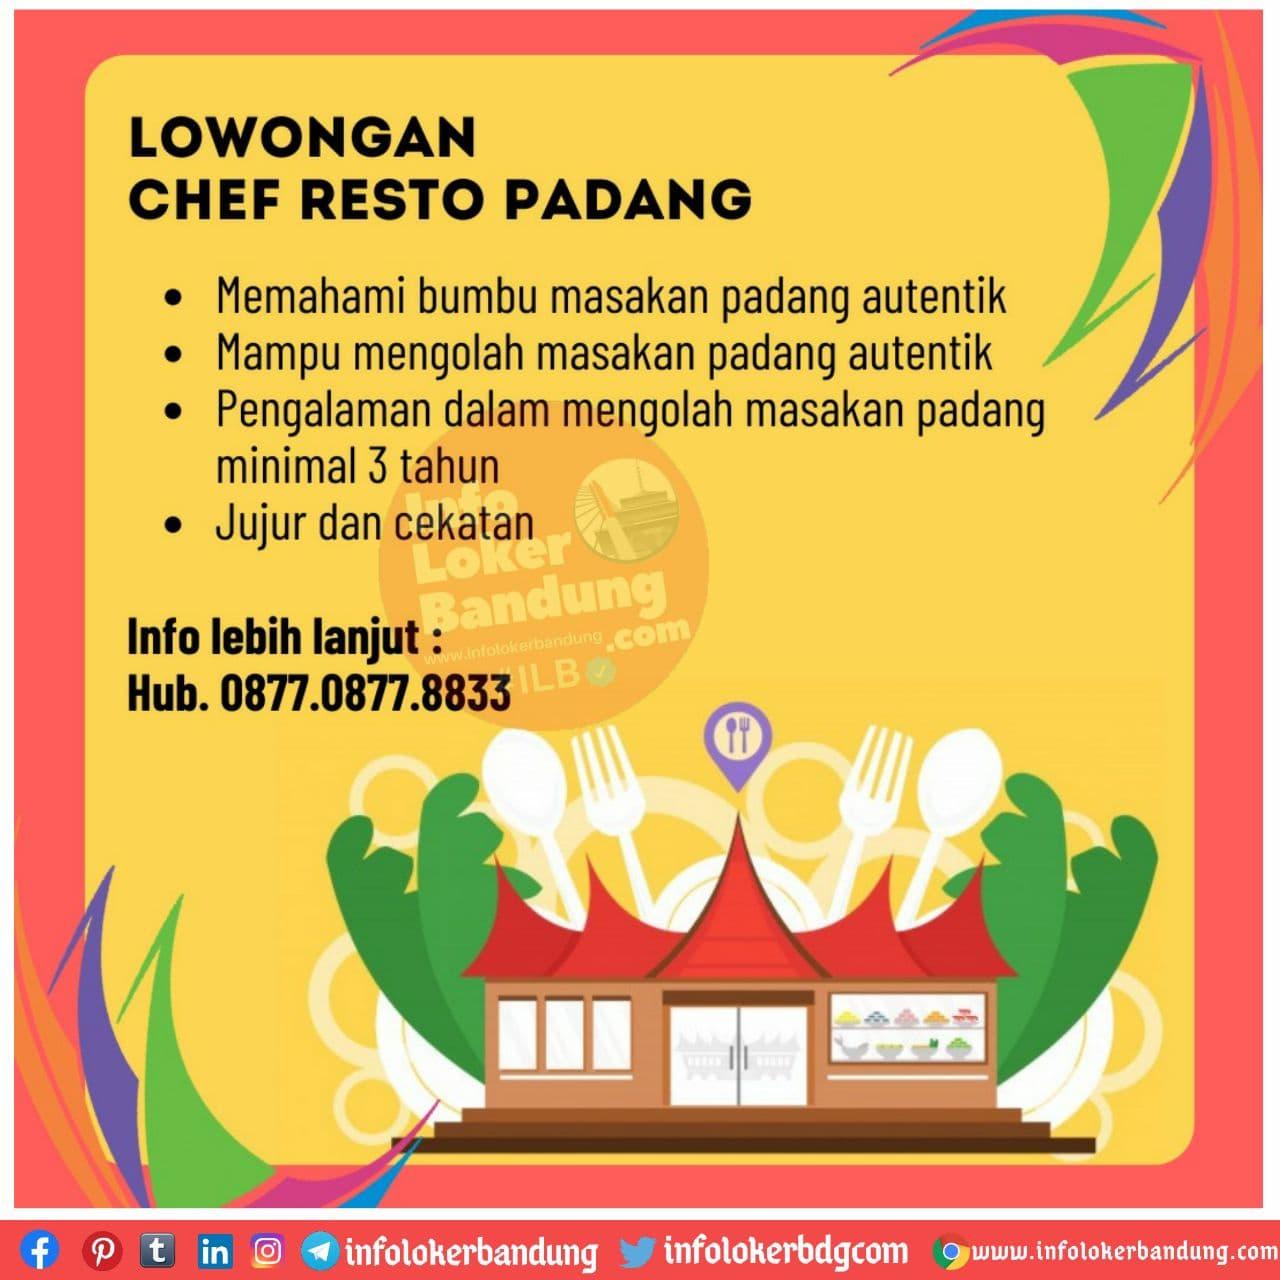 Lowongan Kerja Chef Resto Padang Bandung November 2020